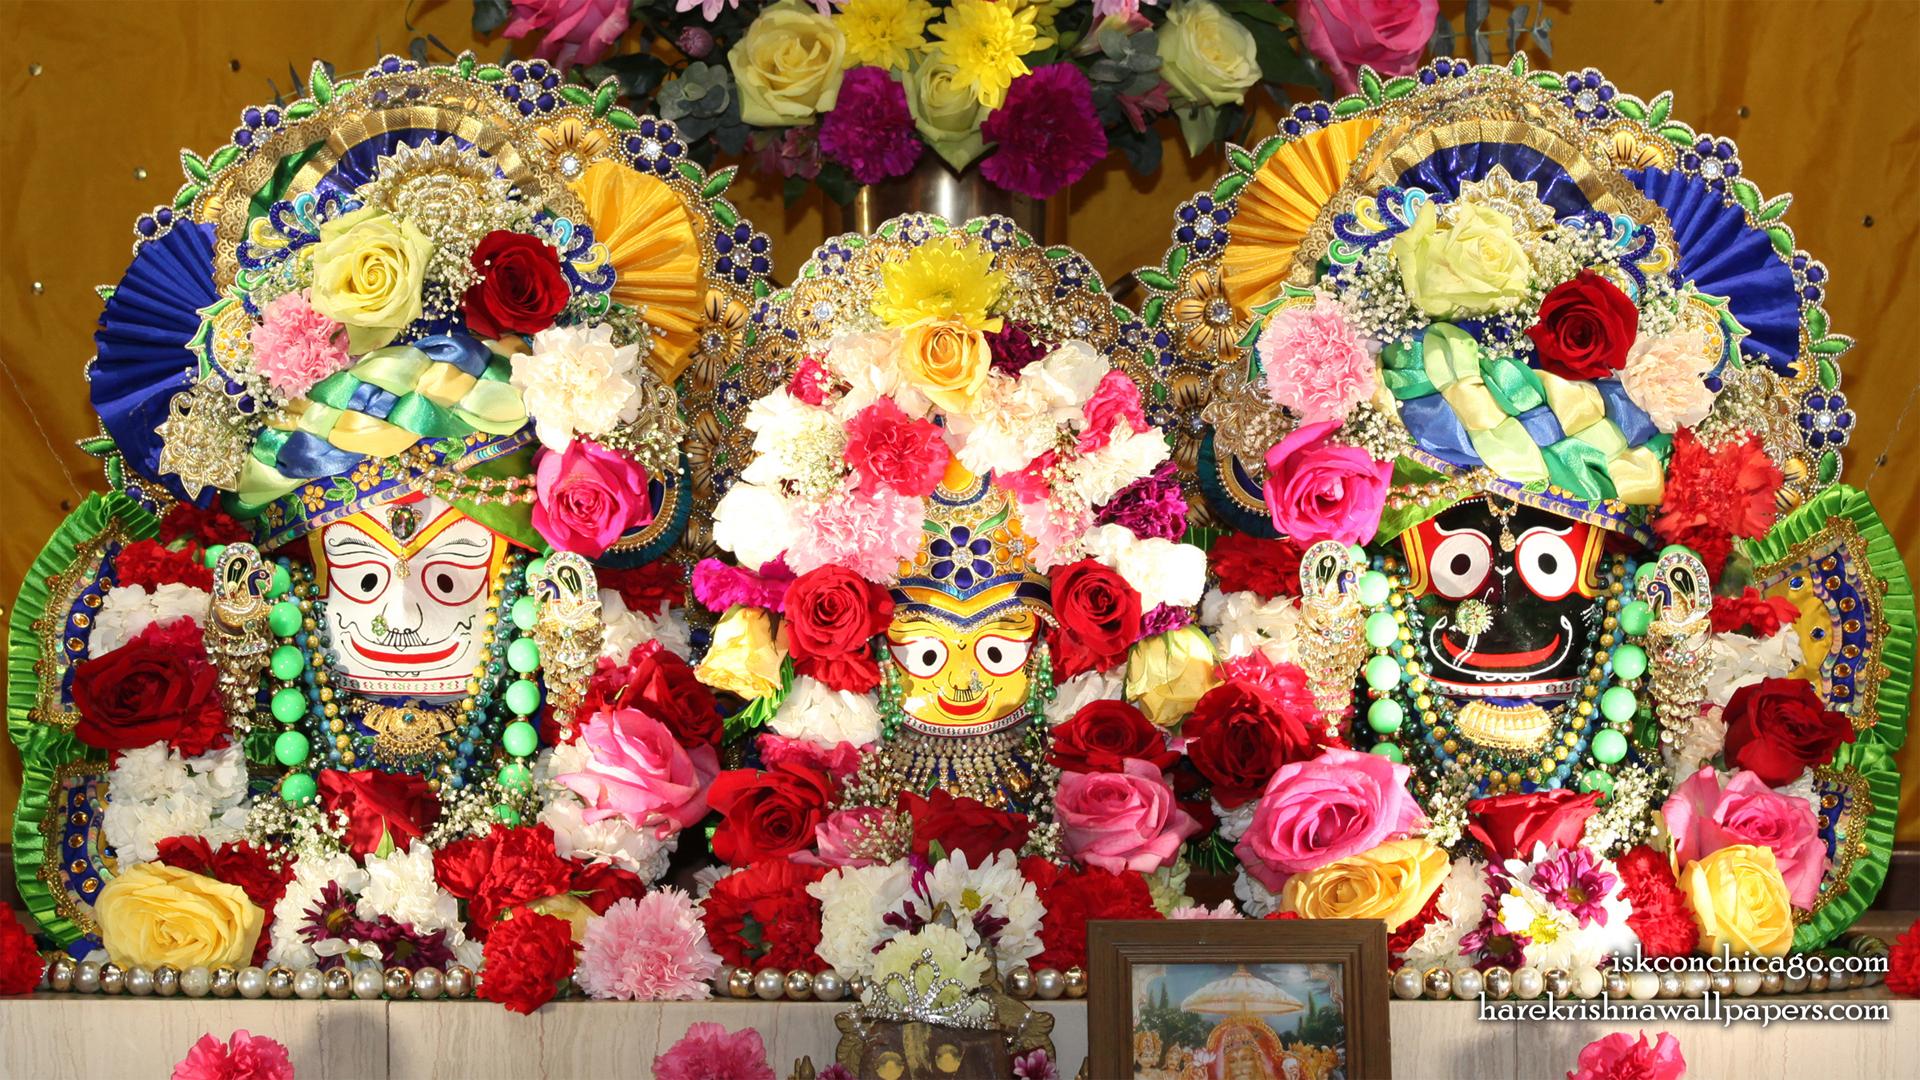 Jagannath Baladeva Subhadra Wallpaper (005) Size 1920x1080 Download